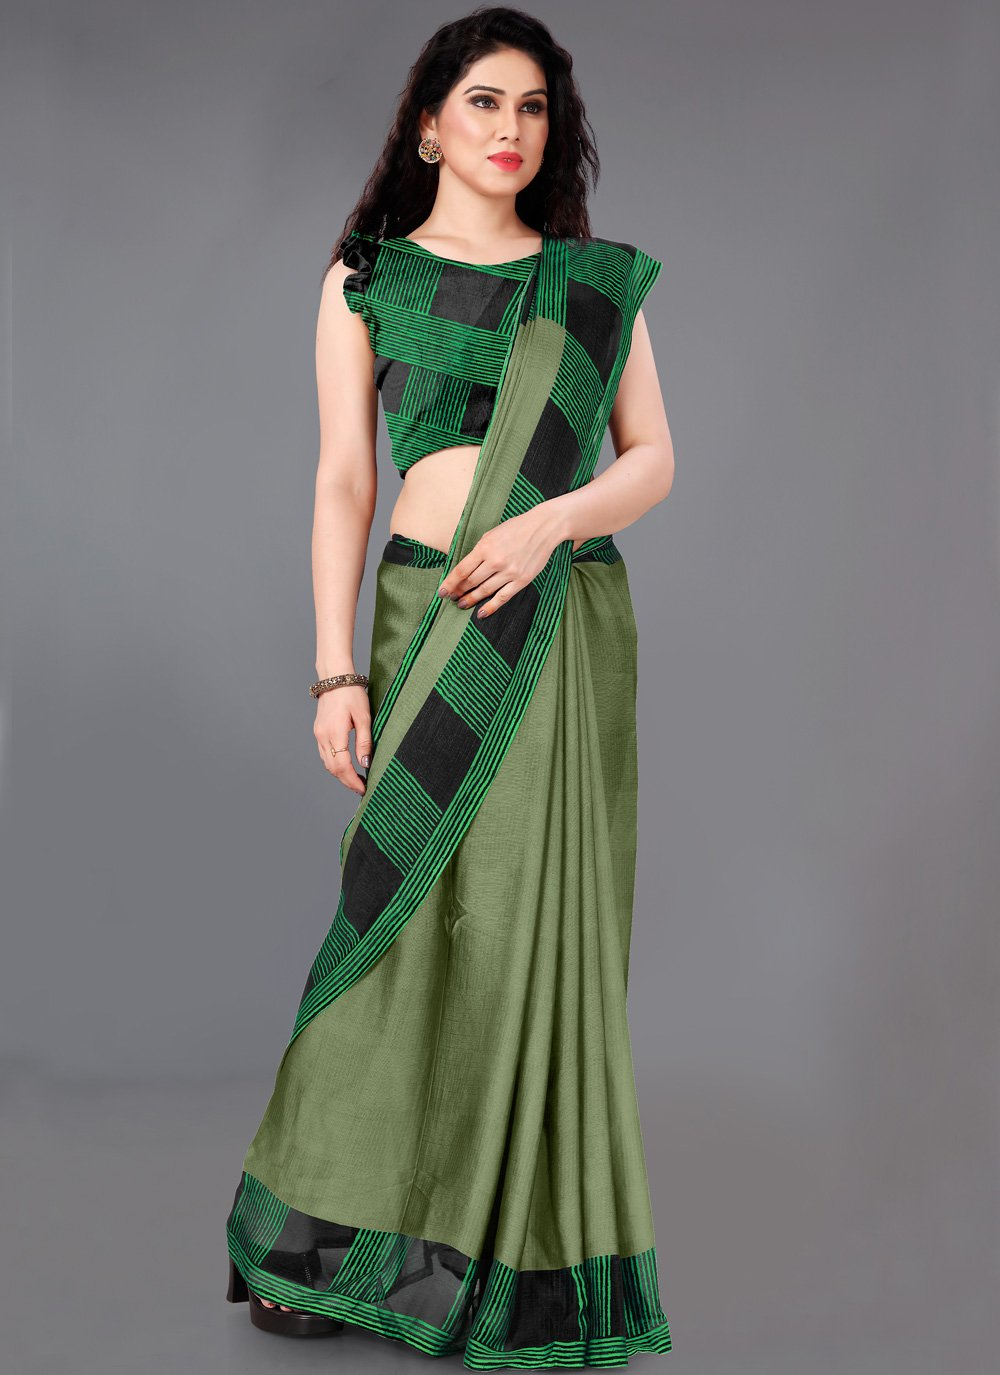 Faux Chiffon Designer Saree in Green